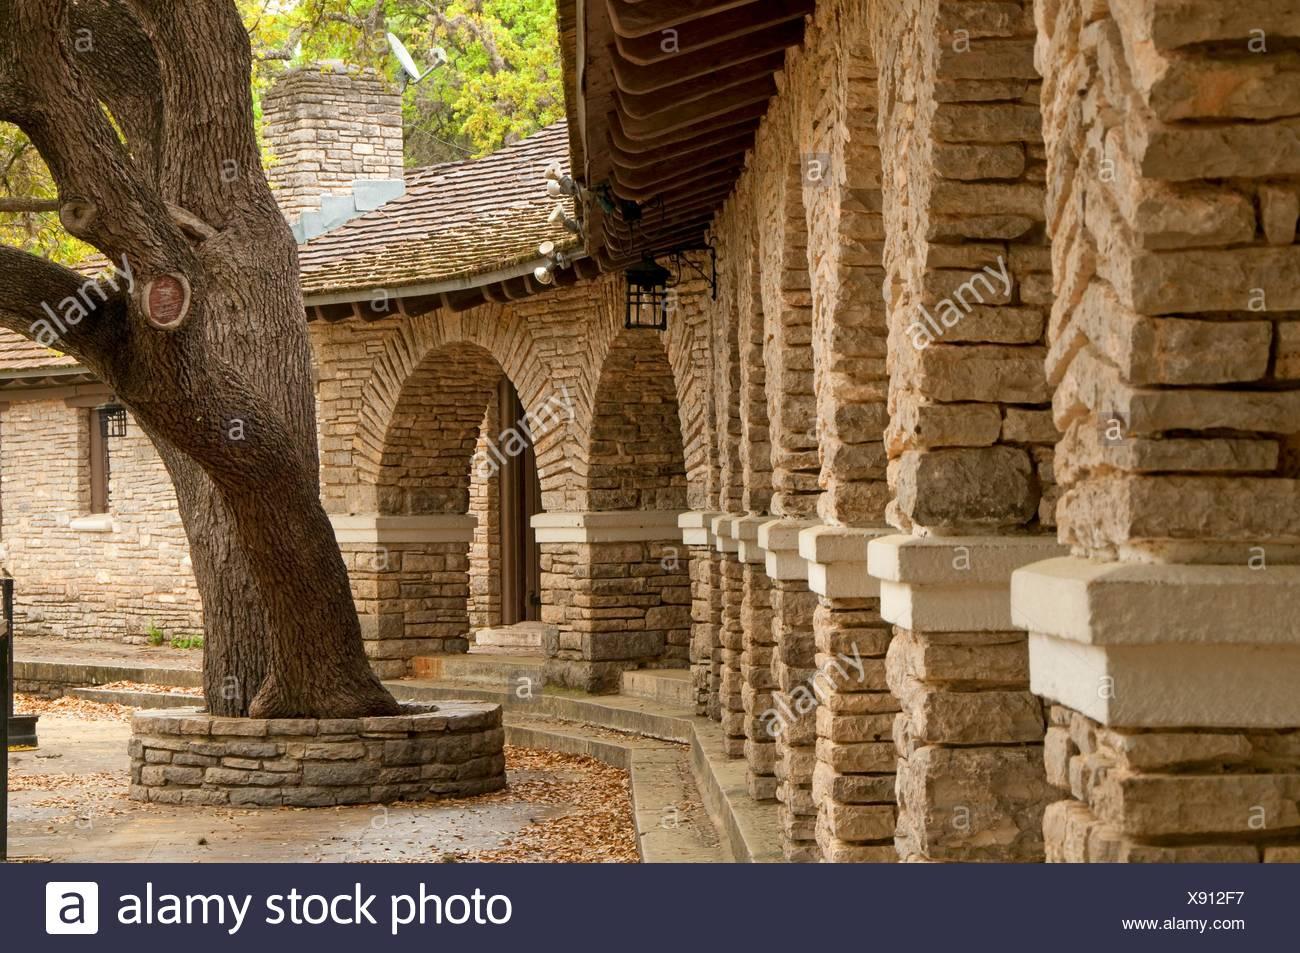 The Pavilion (Civilian Conservation Corps), Garner State Park, Texas. - Stock Image